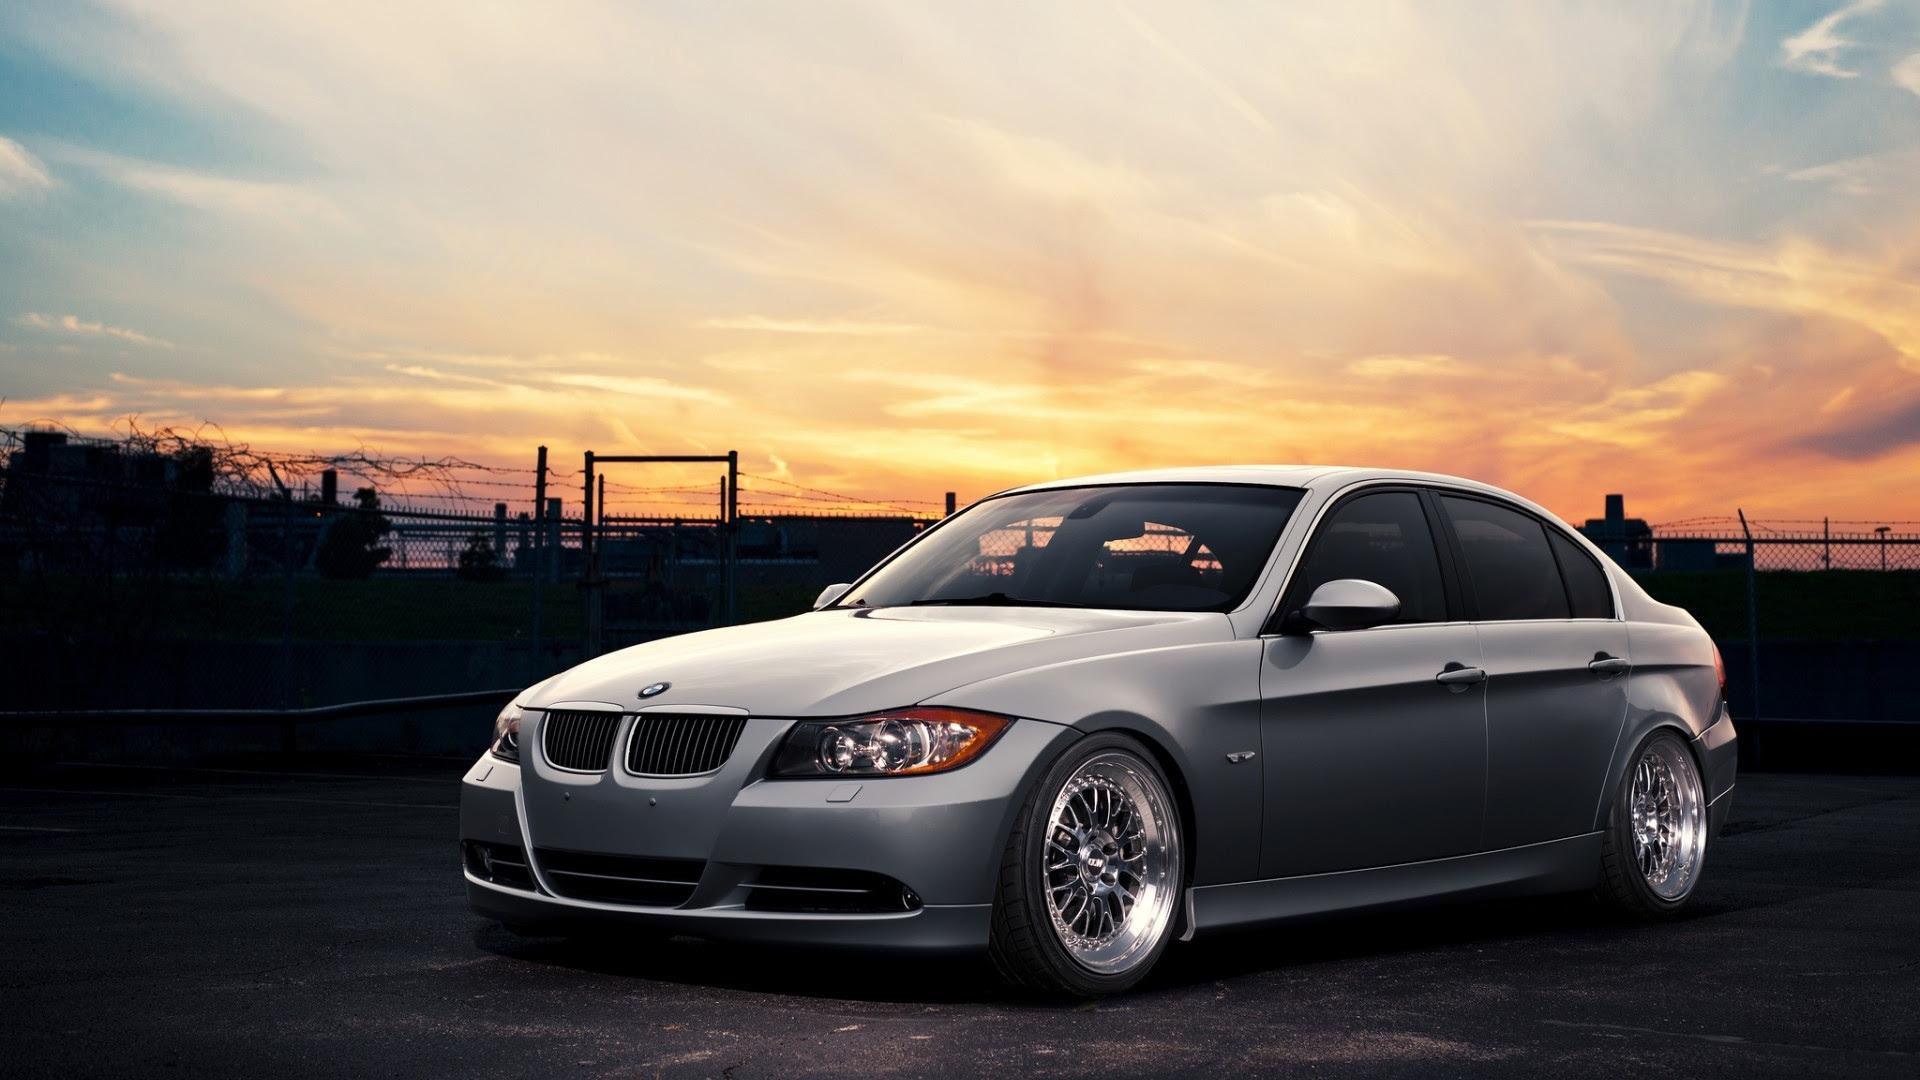 BMW HD Wallpapers 1920x1080  WallpaperSafari